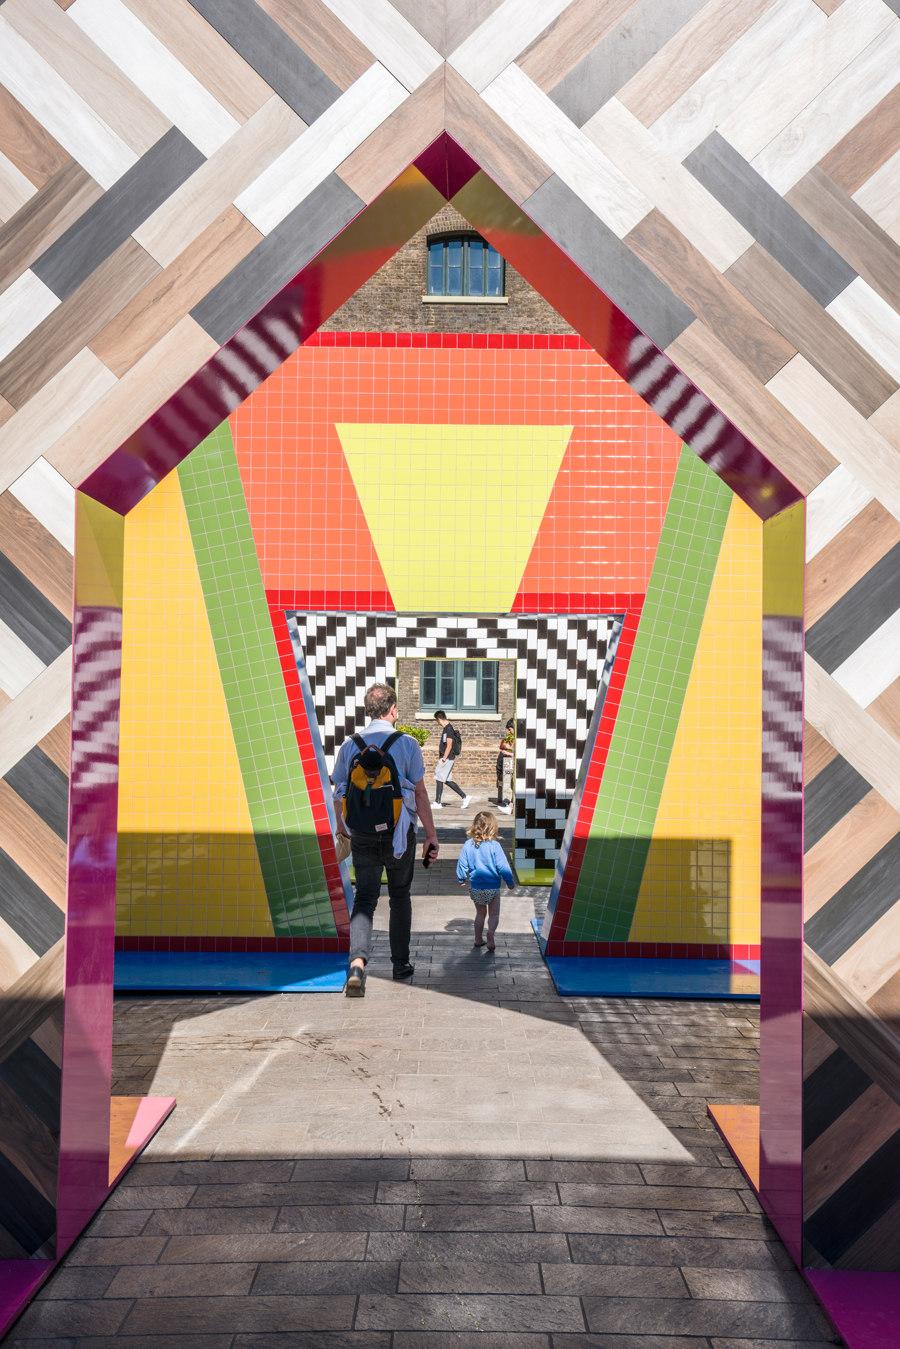 Gateways by Atelier Adam Nathaniel Furman | Temporary structures